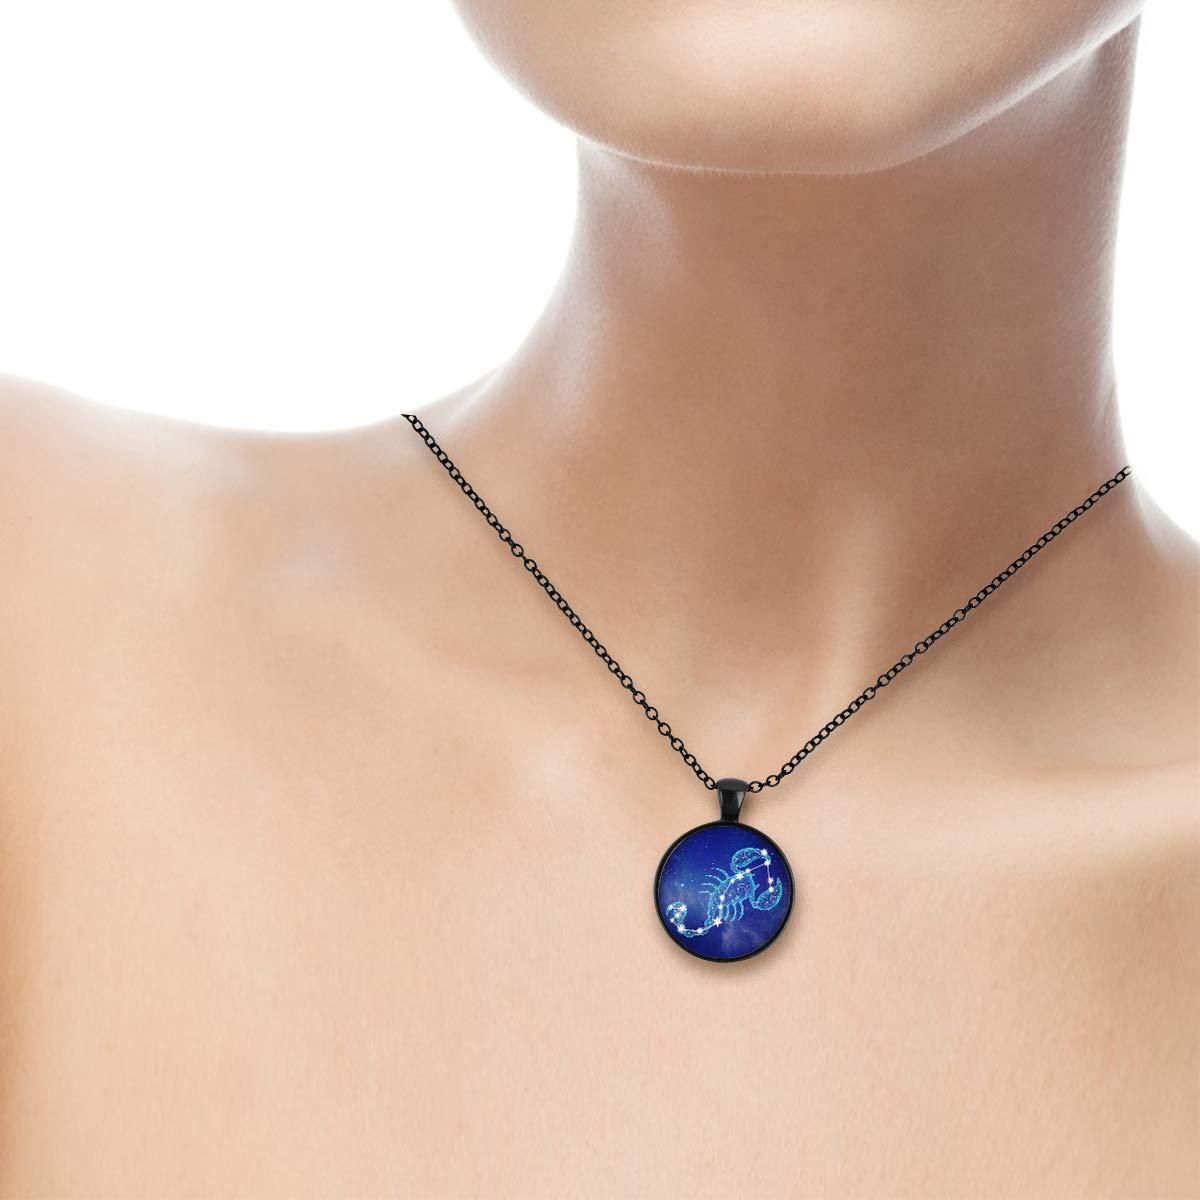 Lightrain Constellation Scorpio Pendant Necklace Vintage Bronze Chain Statement Necklace Handmade Jewelry Gifts